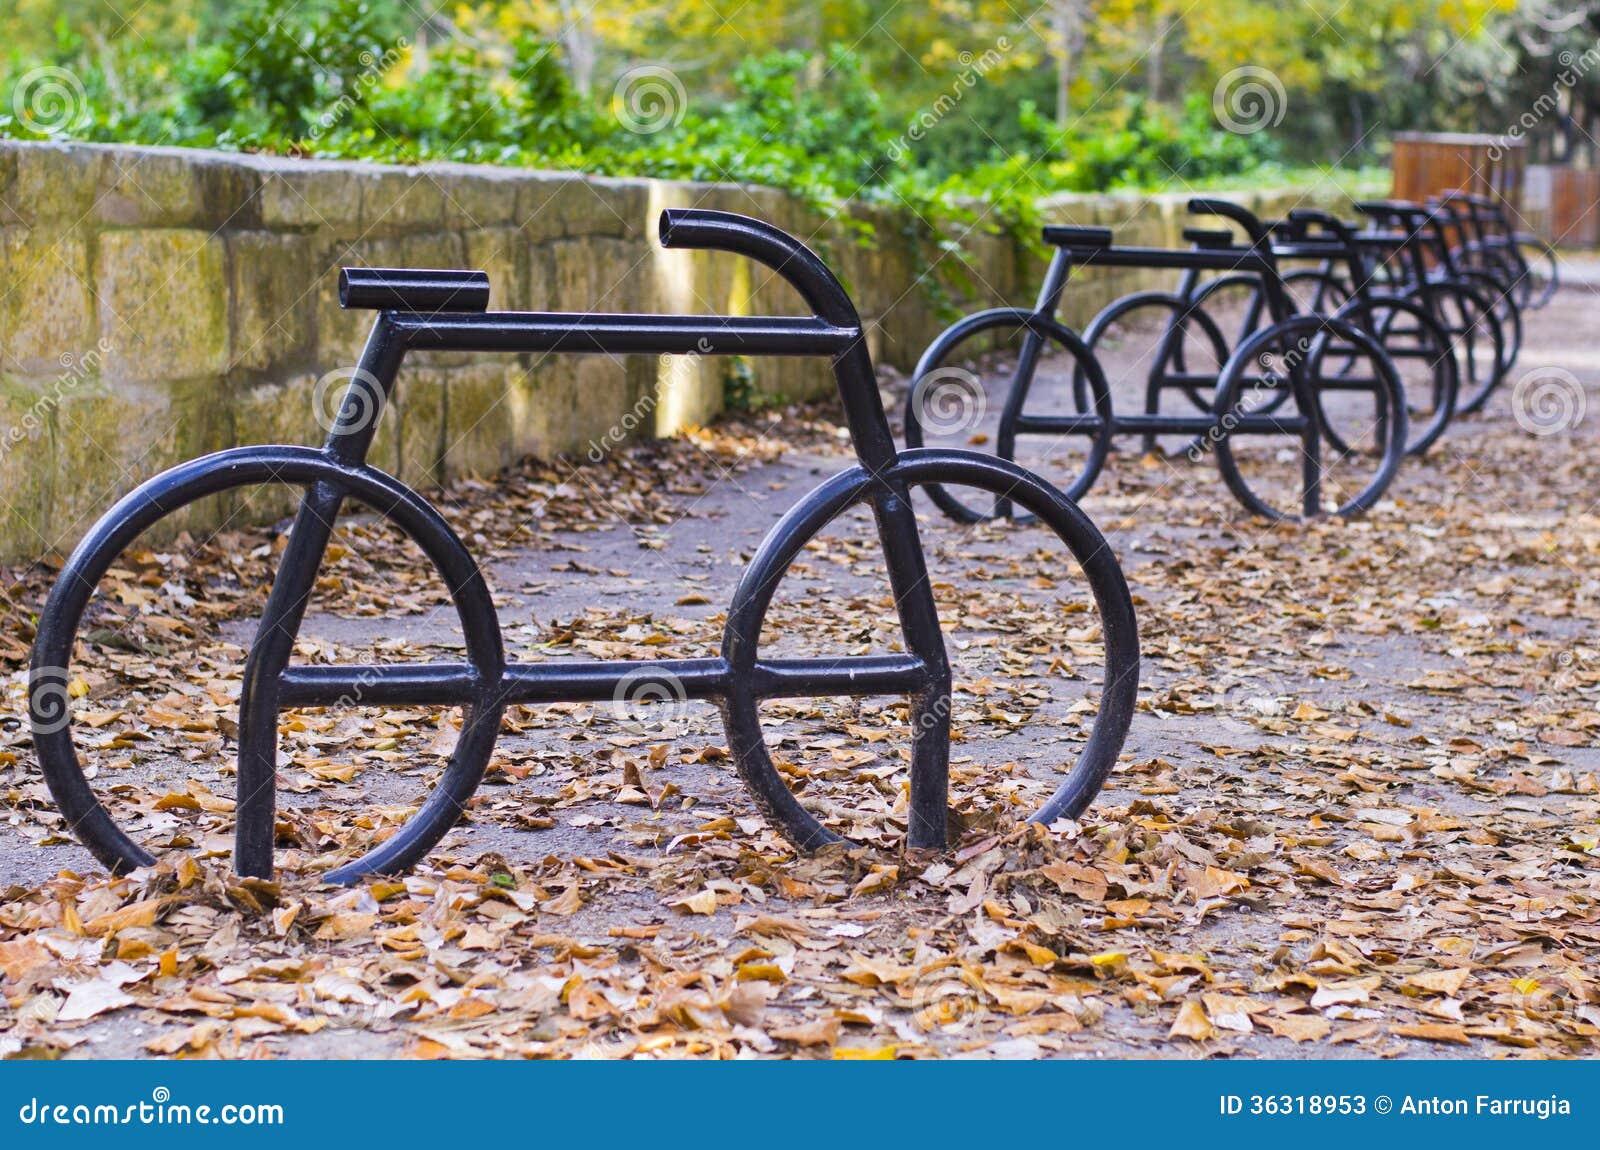 Bicycle Parking Racks Stock Image Image Of Bicycles